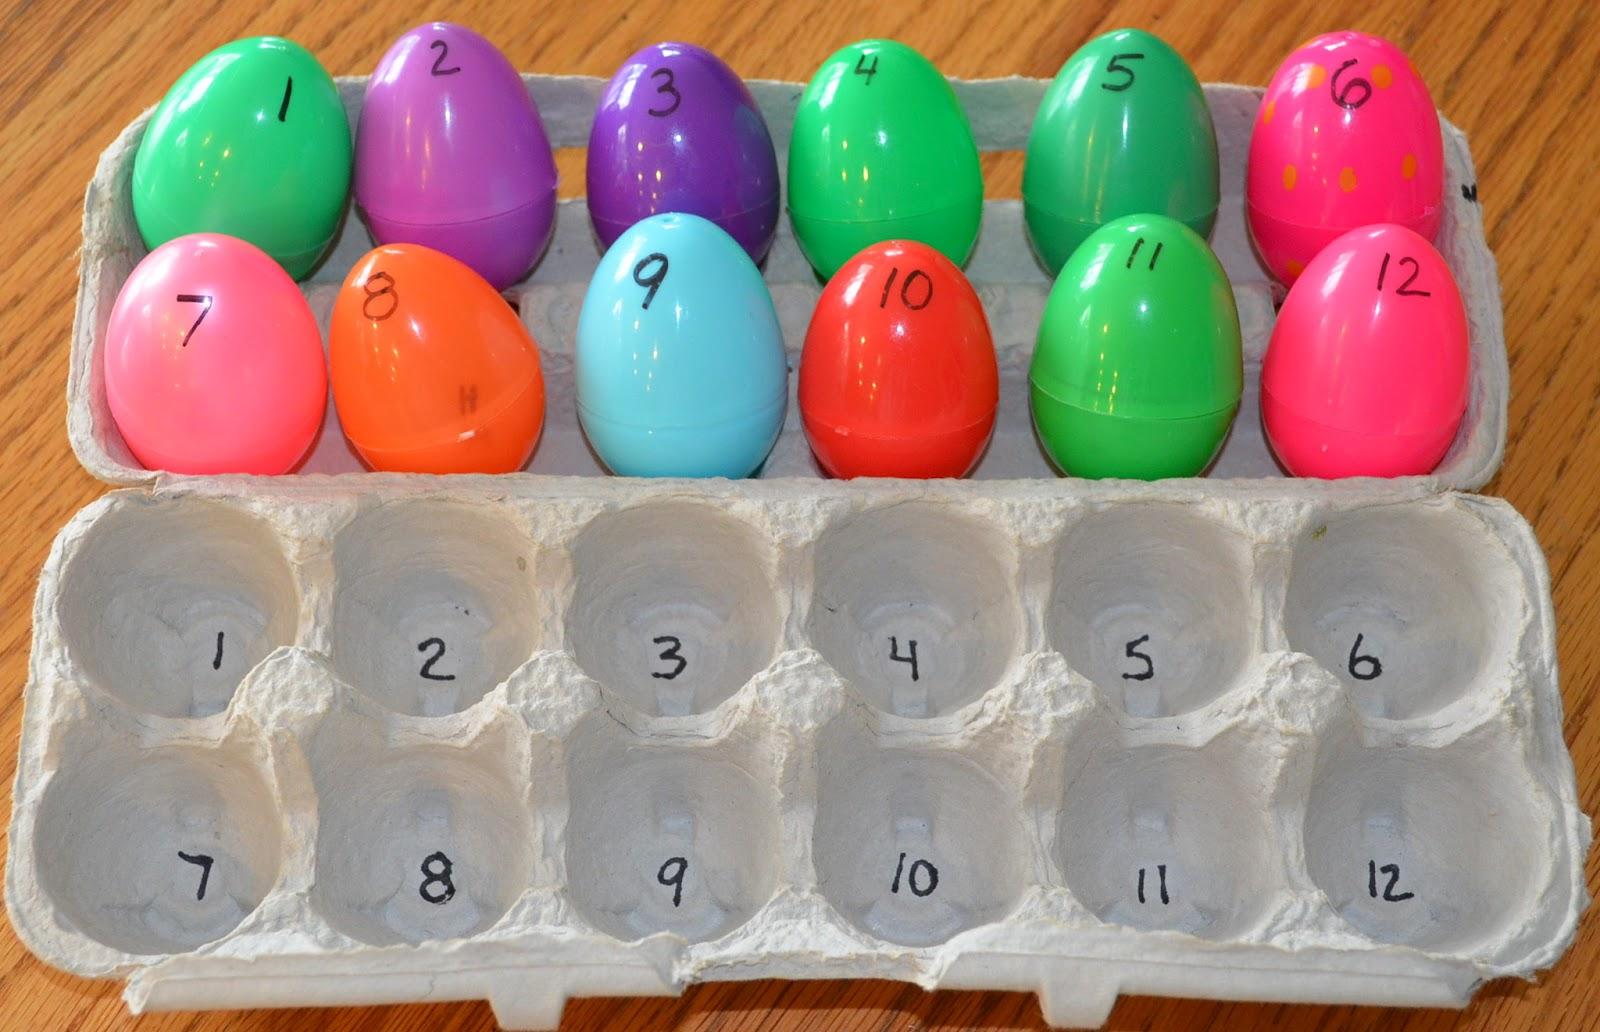 Love2learn2day Plastic Eggs